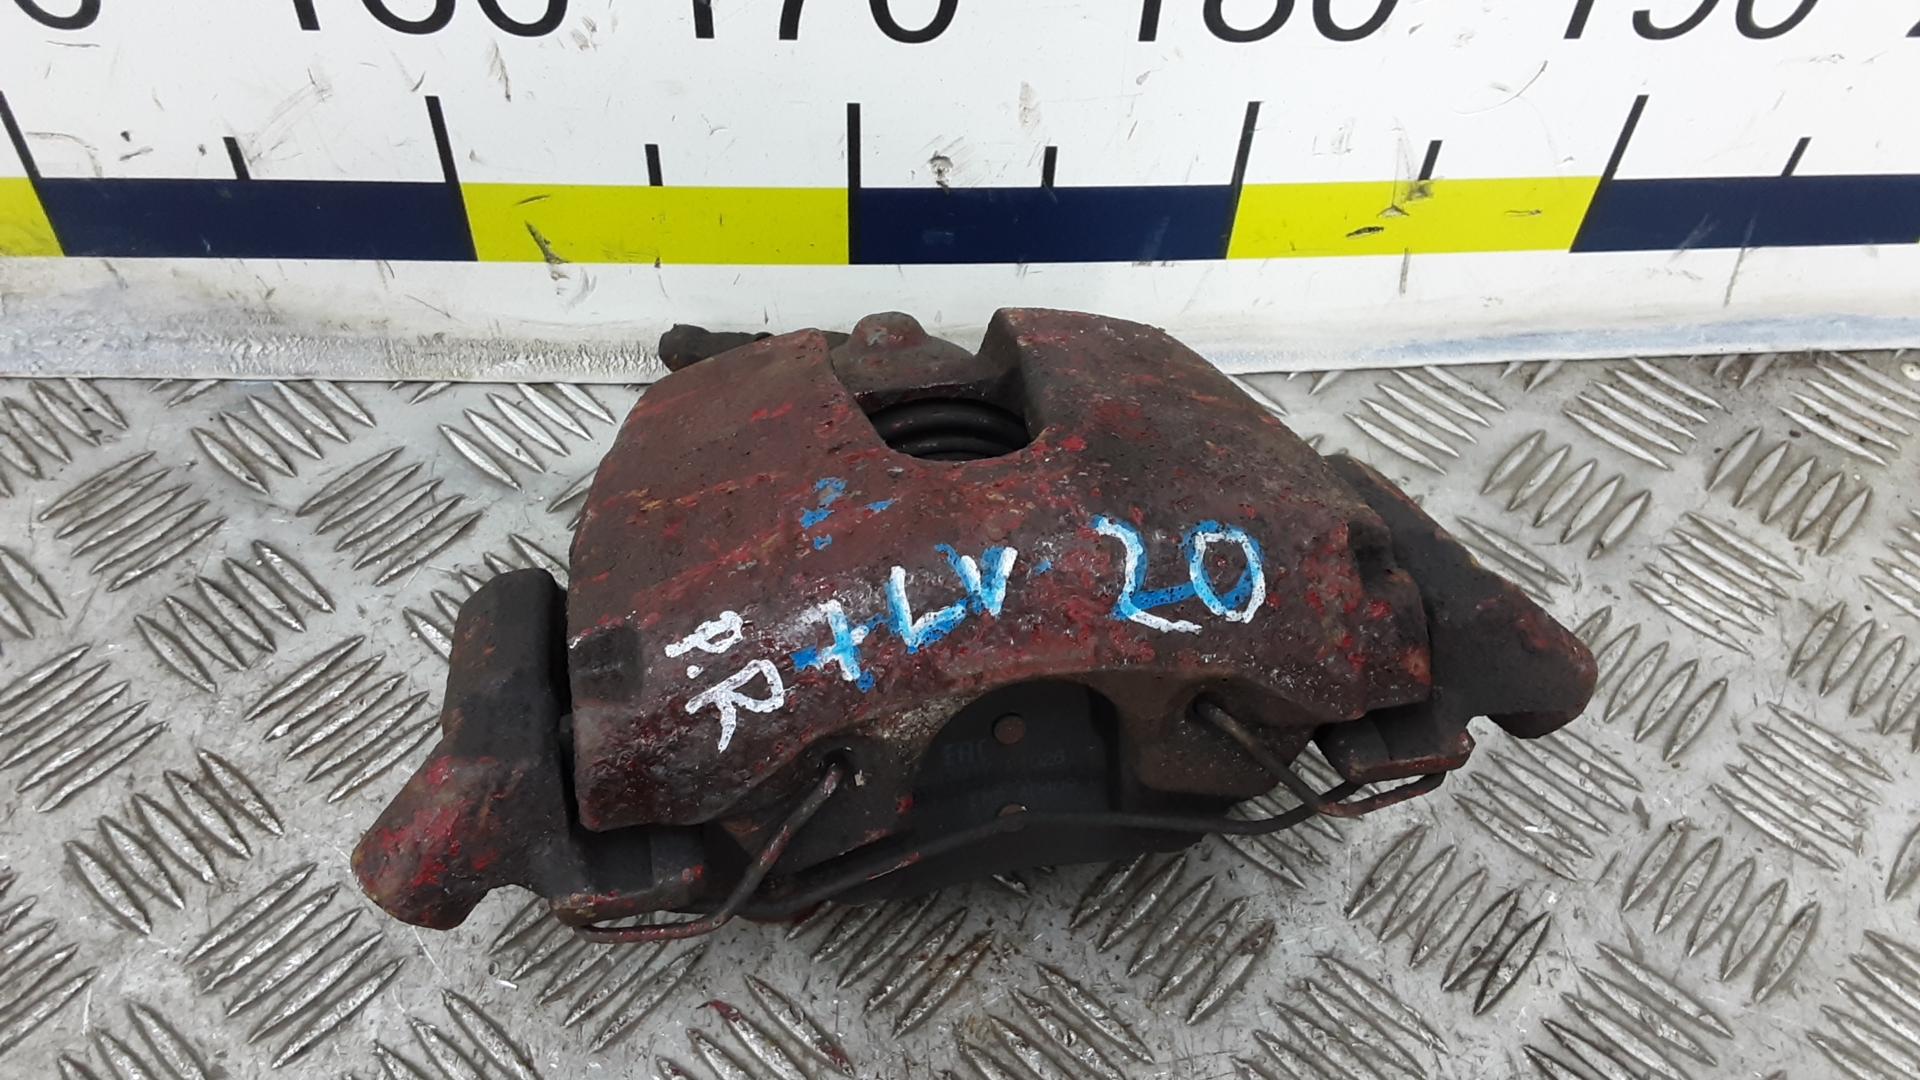 Суппорт тормозной передний правый, VOLVO, S40 II MS, 2008